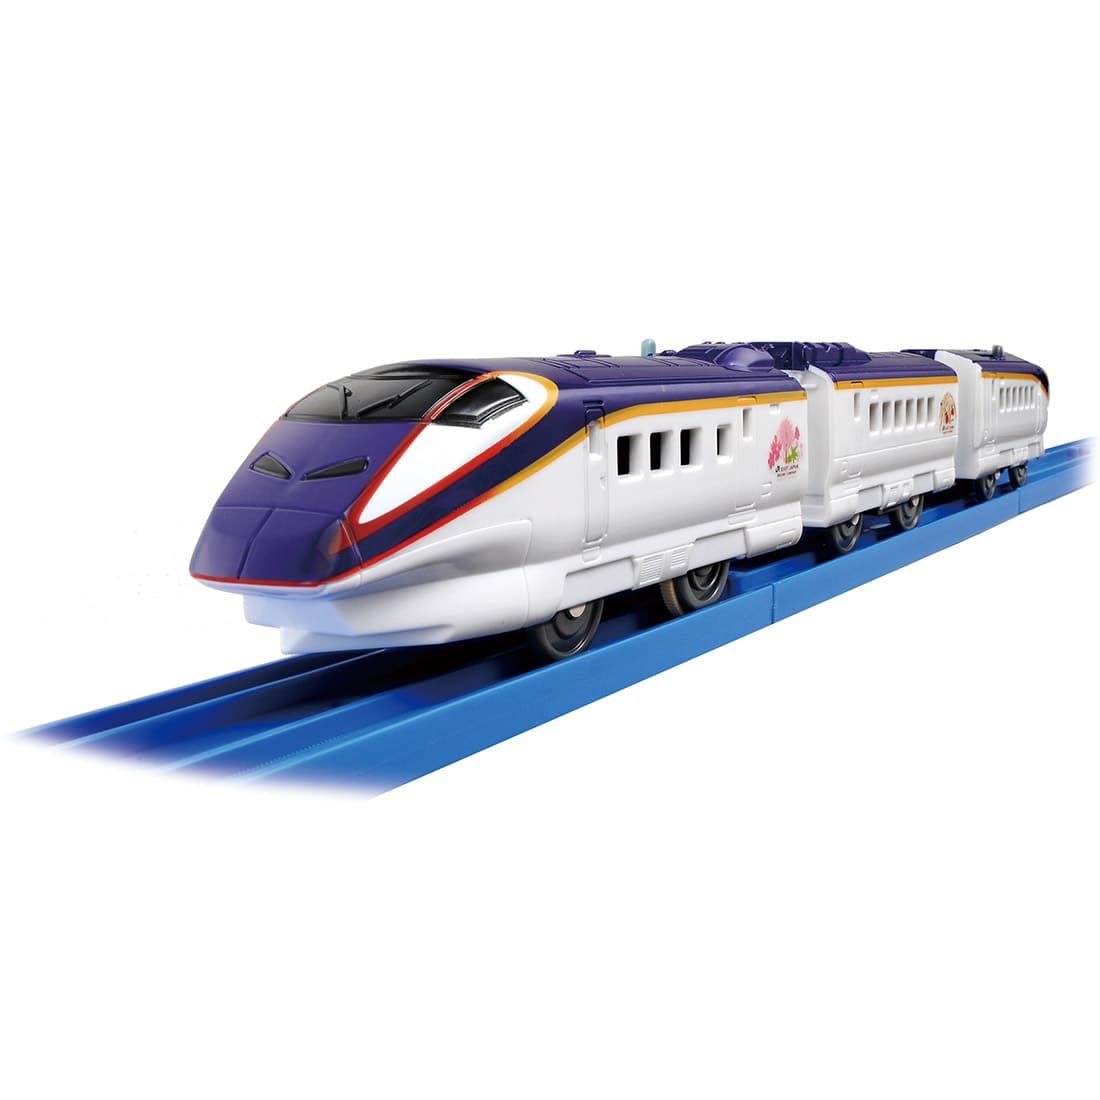 《TAKARA TOMY》 PLARAIL鐵道王國 S-09 E3系翼號2000番台 東喬精品百貨